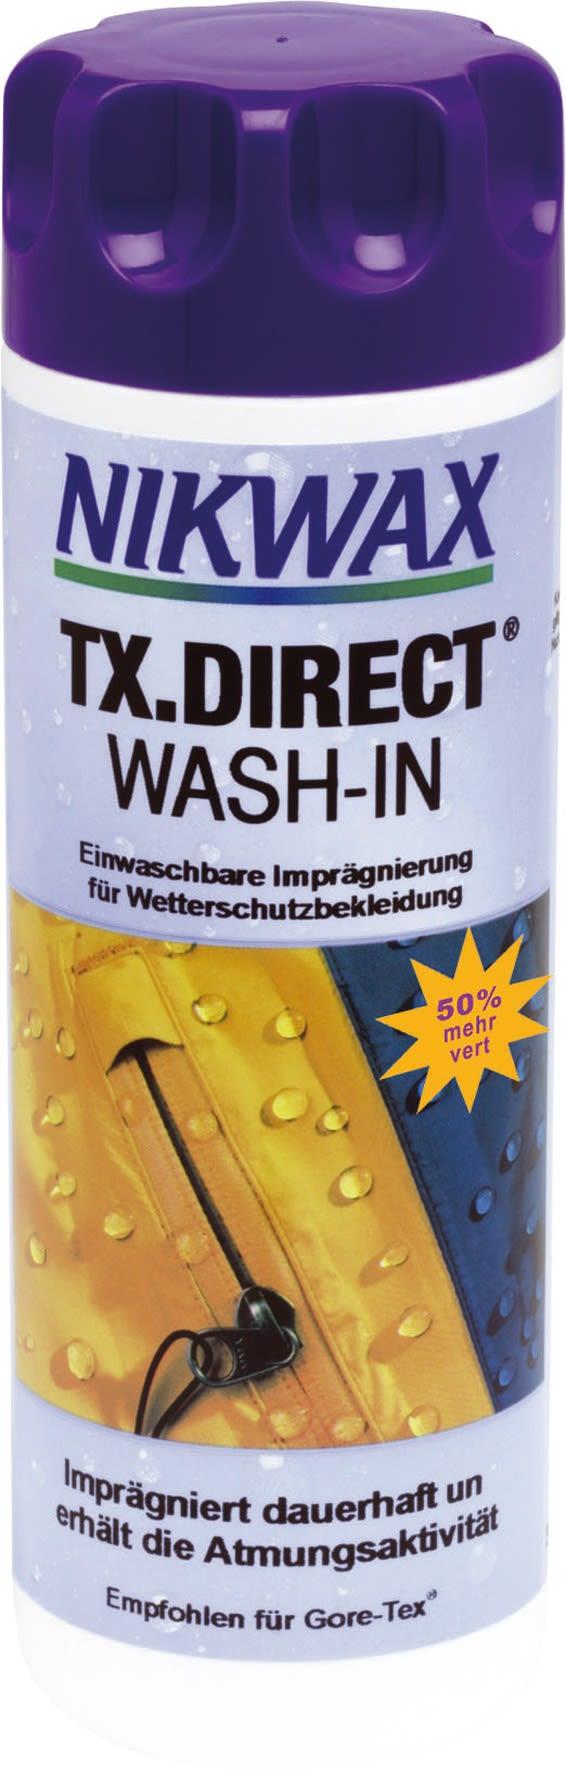 Vaude Nikwax TX-Direct 300ml 300 ml -Farbe Uni, 300 ml